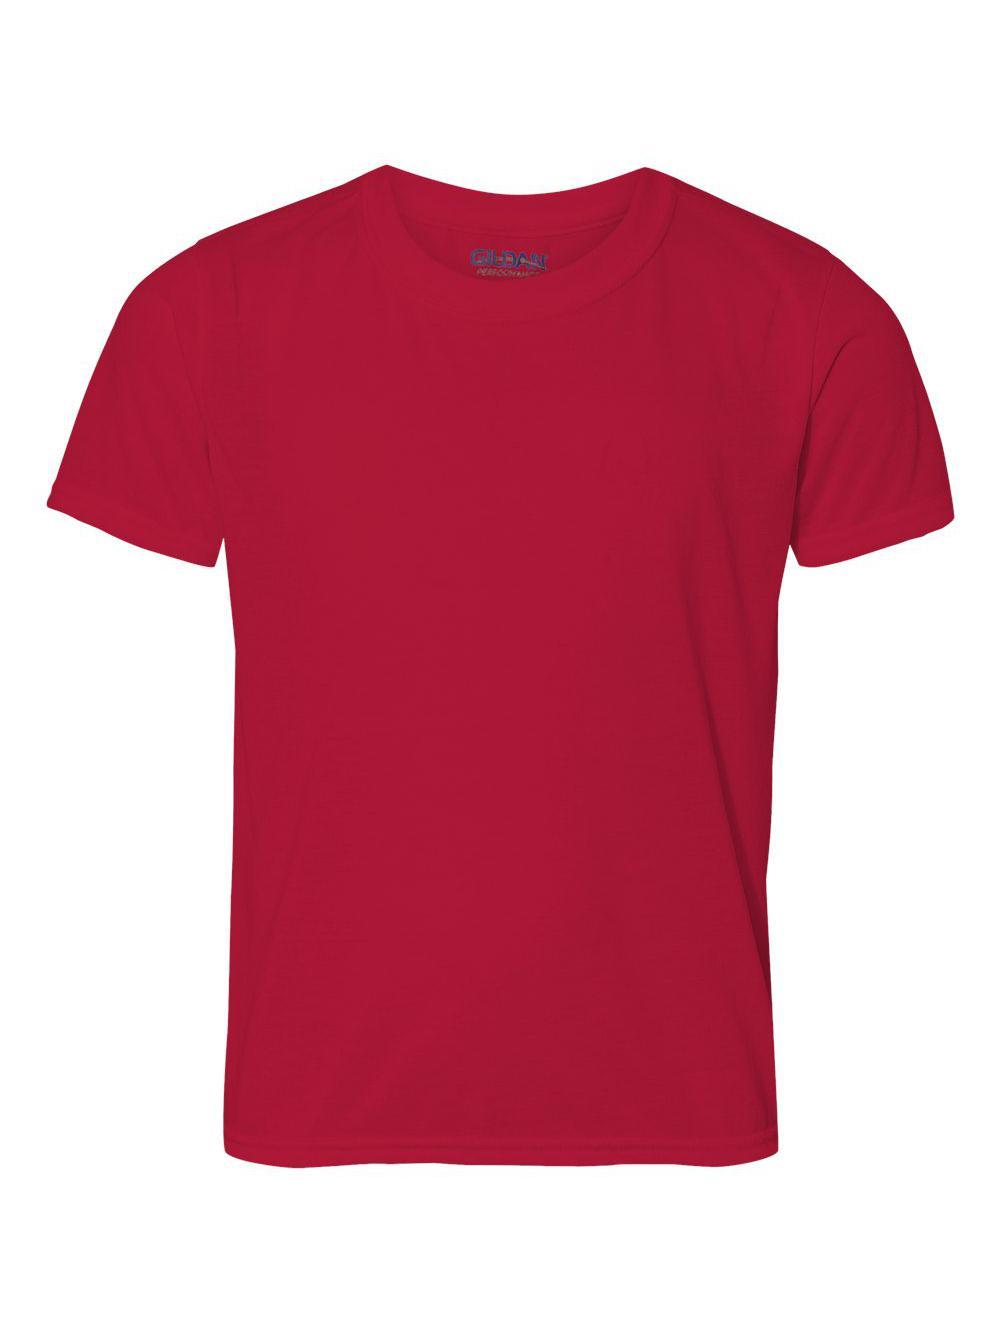 Gildan-Performance-Youth-T-Shirt-42000B thumbnail 15